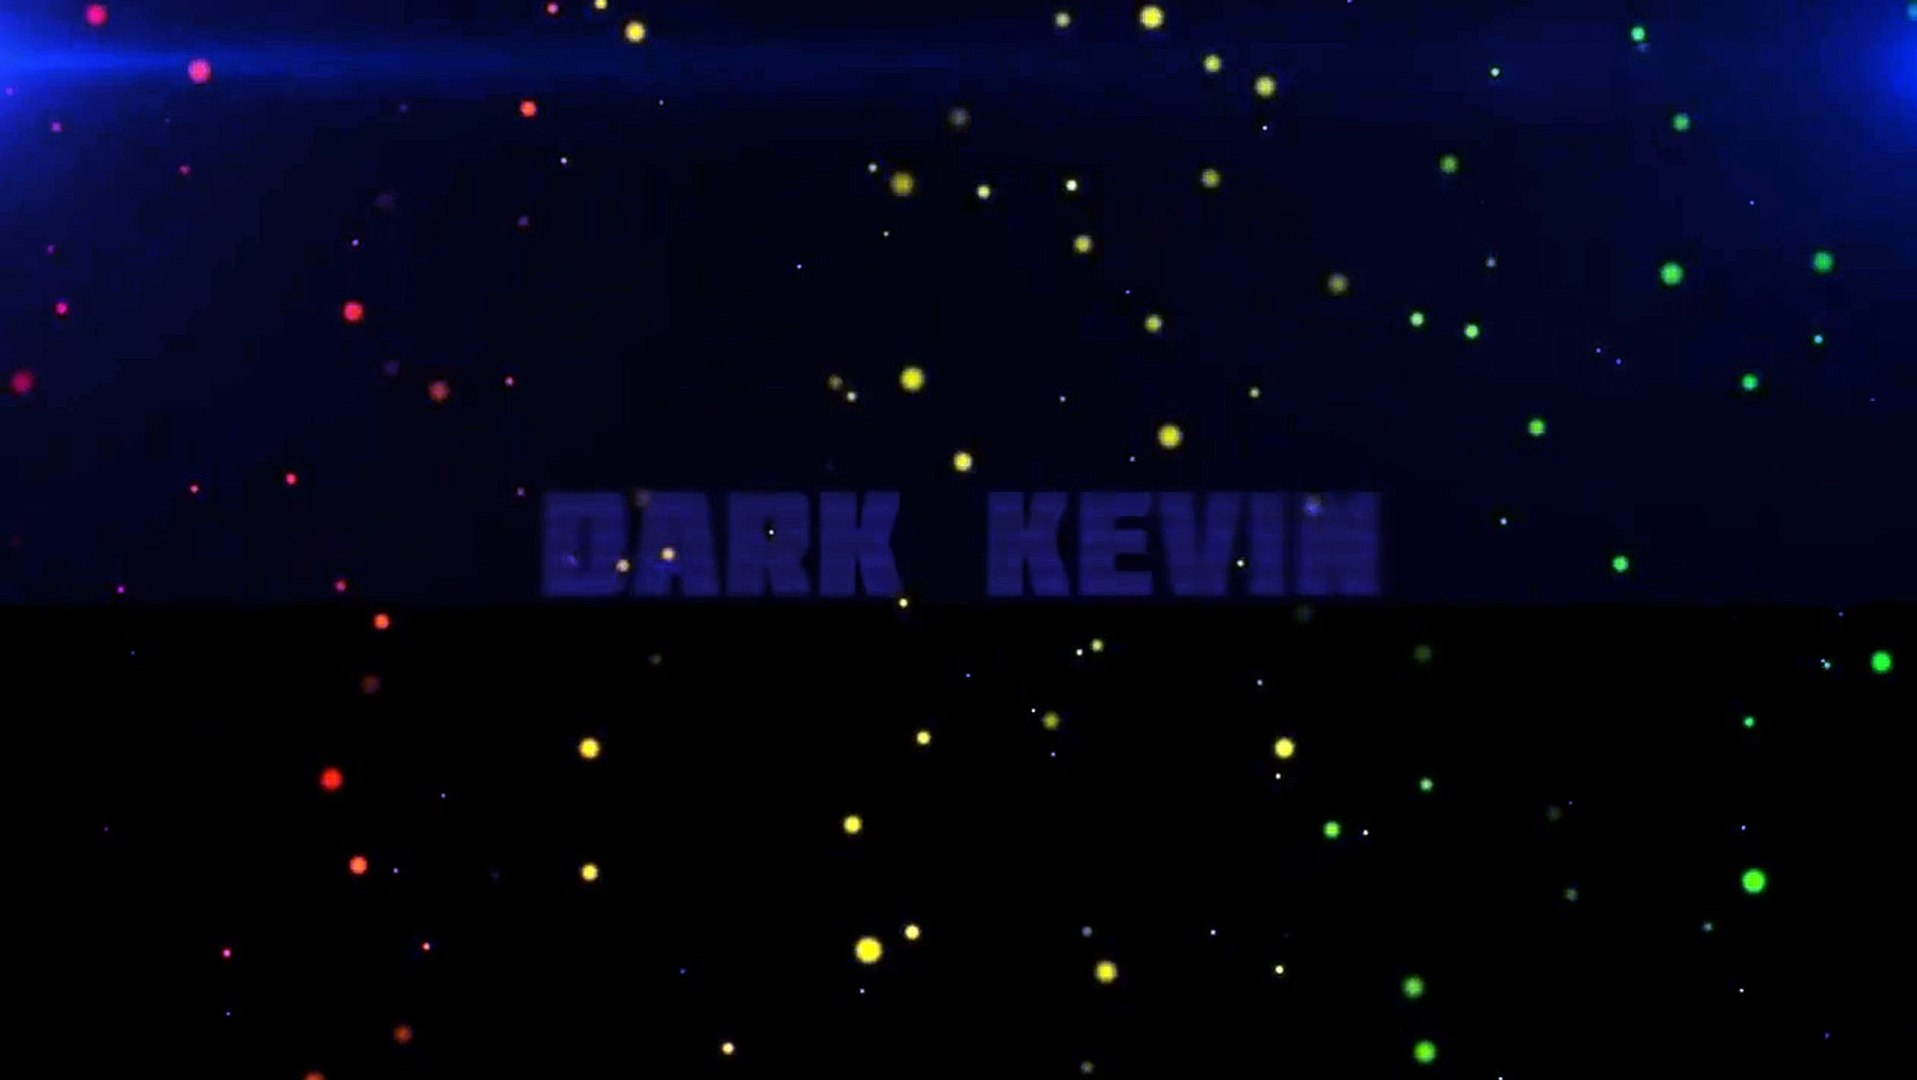 Интро на заказ #2 - Заказал Dark Kevin